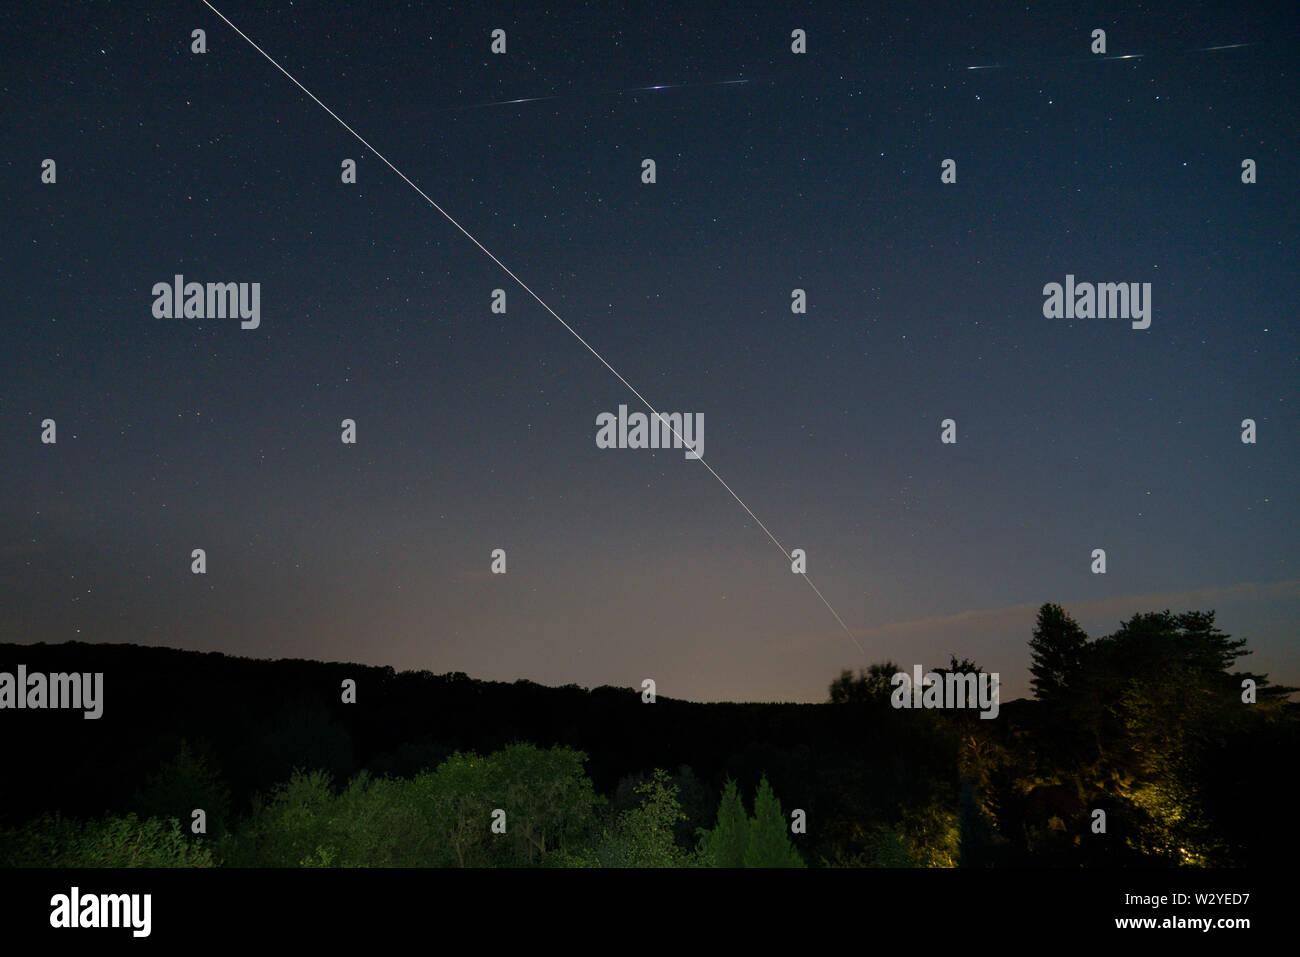 Iridium Flare, ISS, unknown Satellite, Natural park Muenden, Lower Saxony, Germany Stock Photo